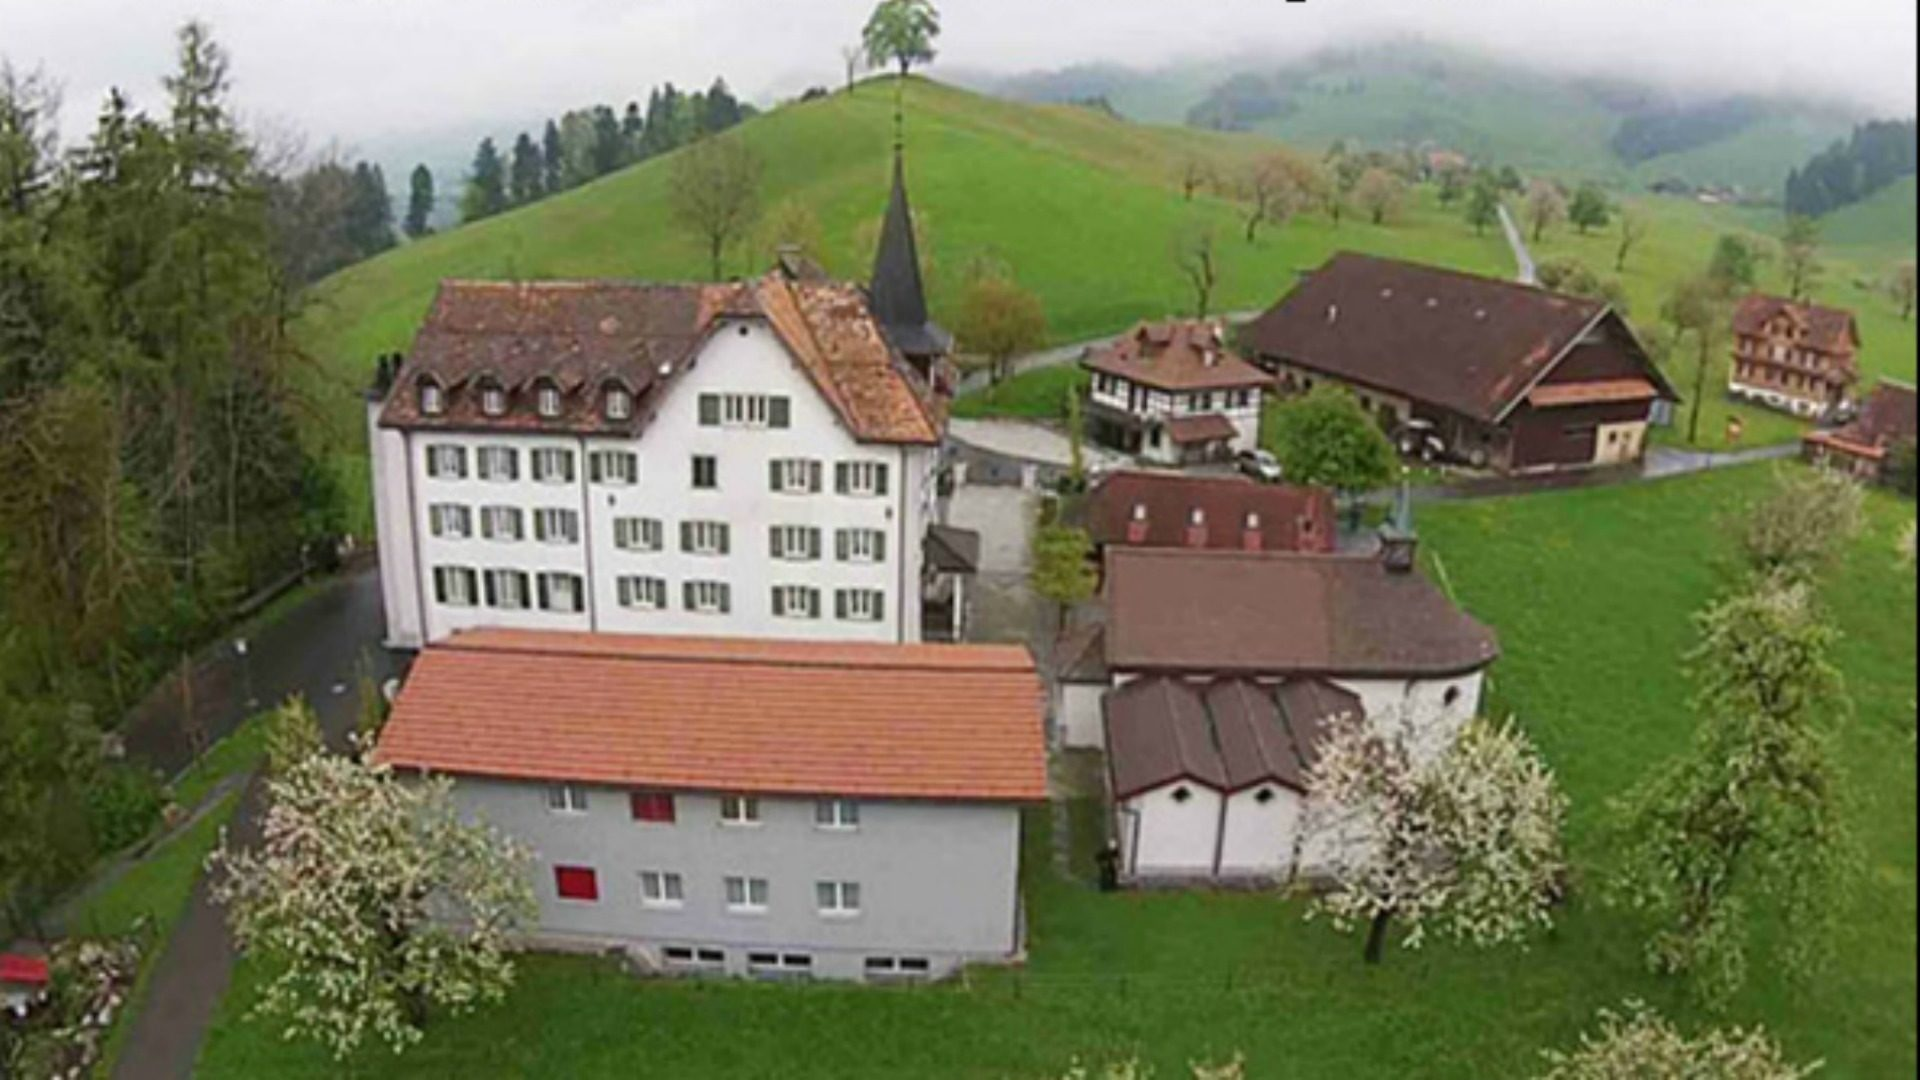 Suisse la fsspx ne va pas transf rer rome sa maison for Porte latine